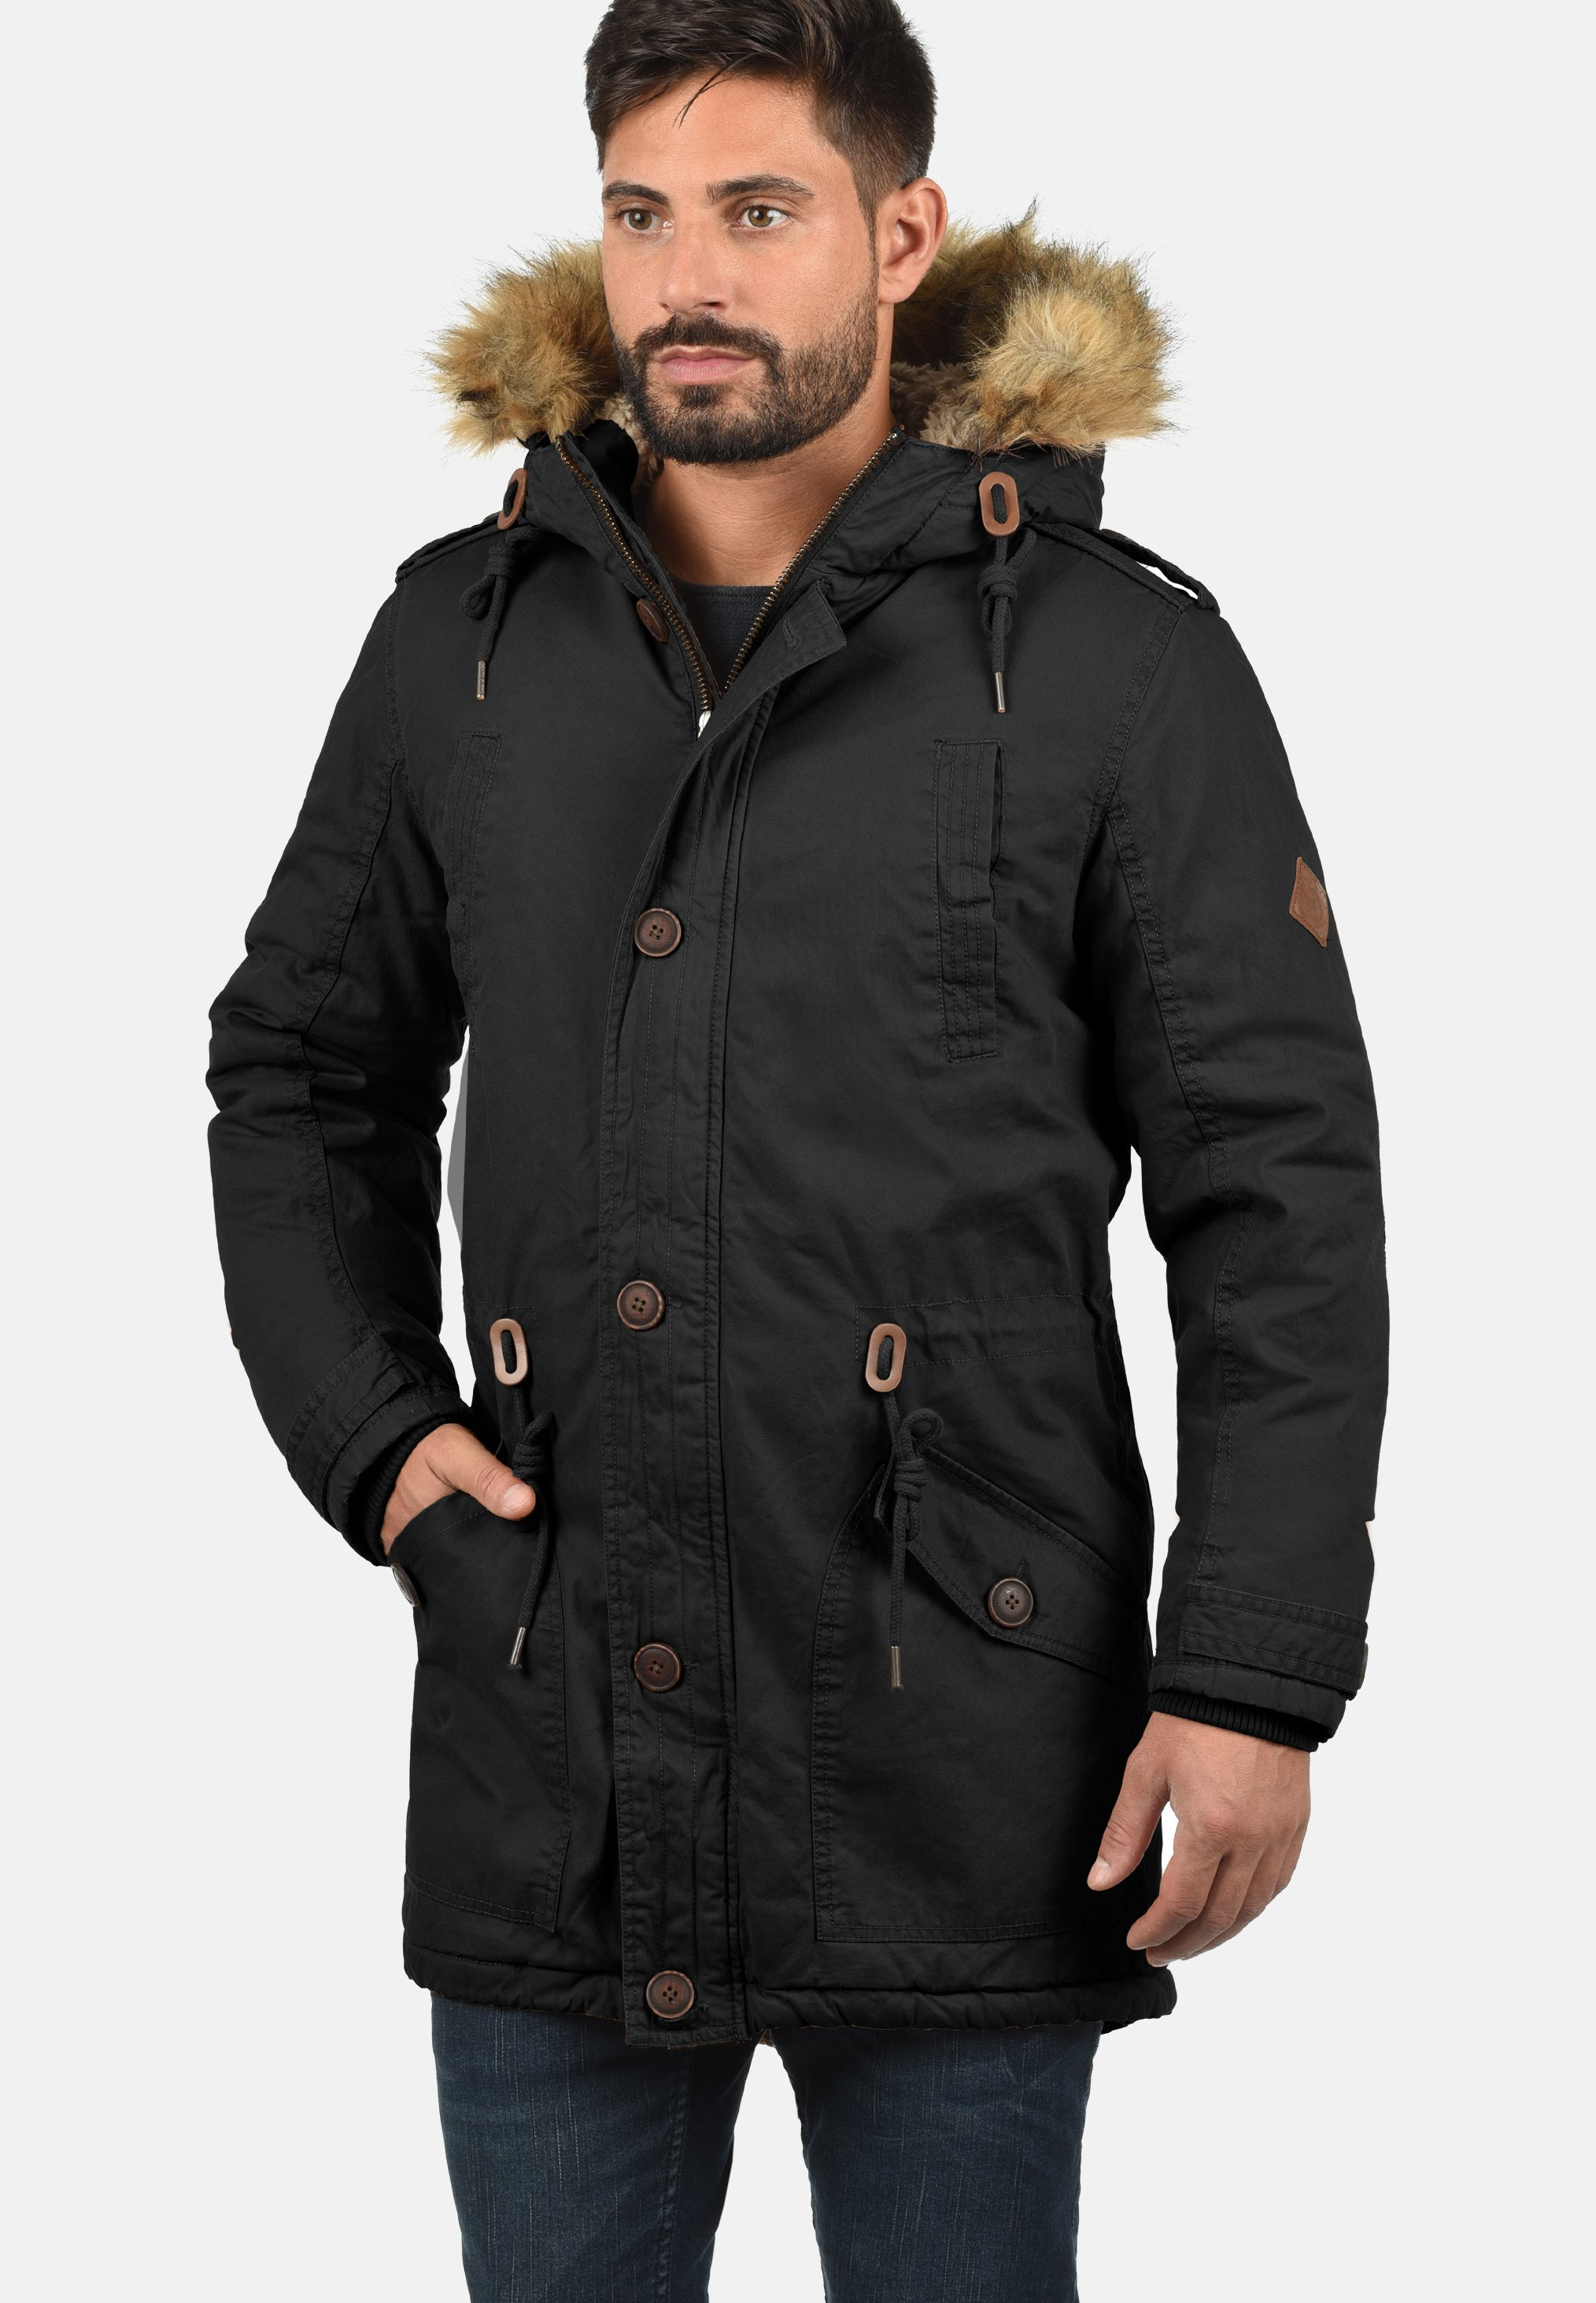 Homme WINTERJACKE CLARKI TEDDY - Veste d'hiver